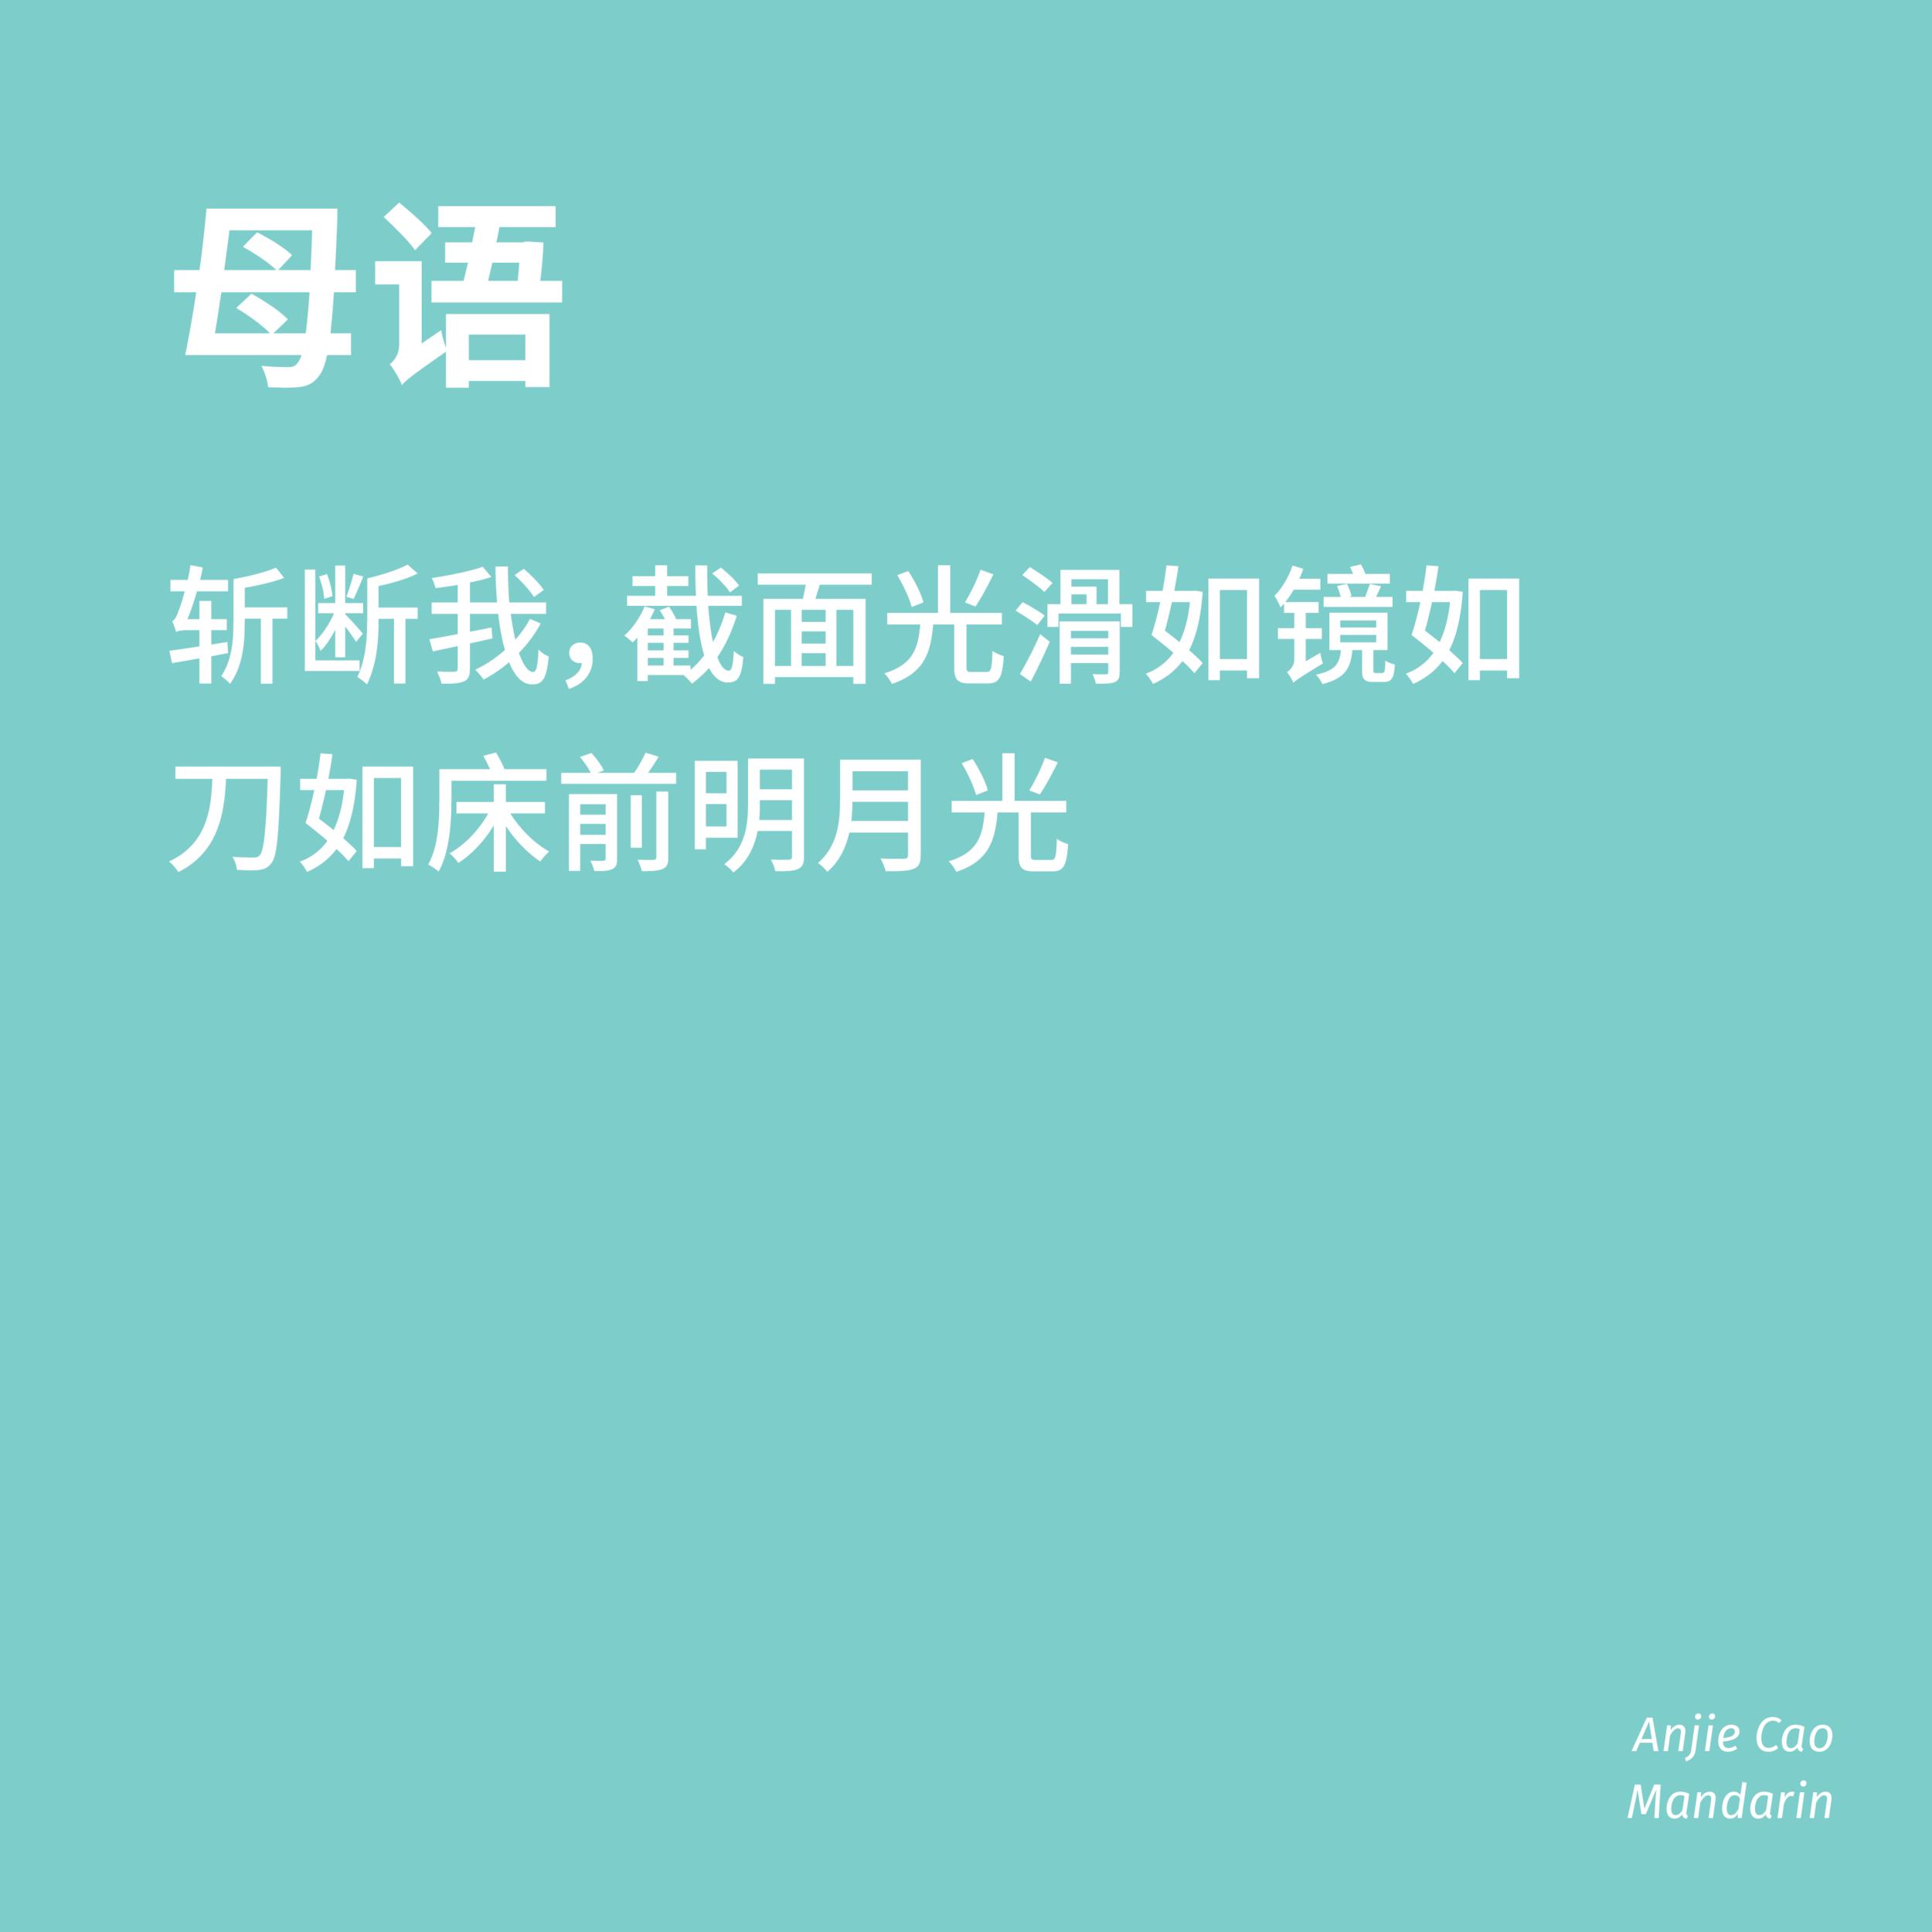 logue_typo_finals-12.png